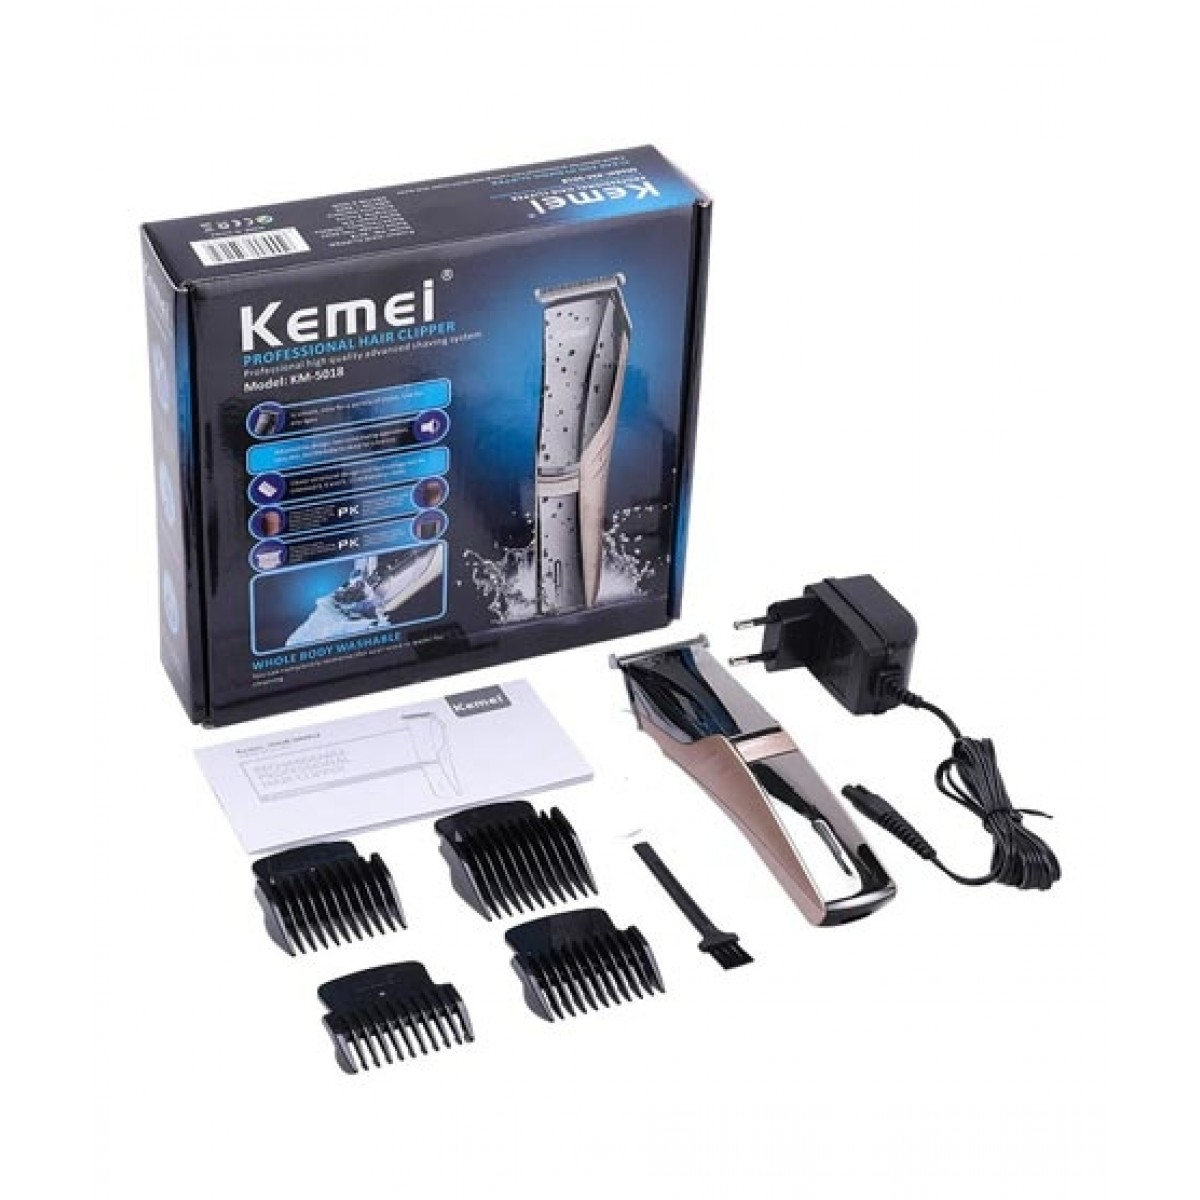 Kemei Professional Hair Clipper & Trimmer (KM-5018)